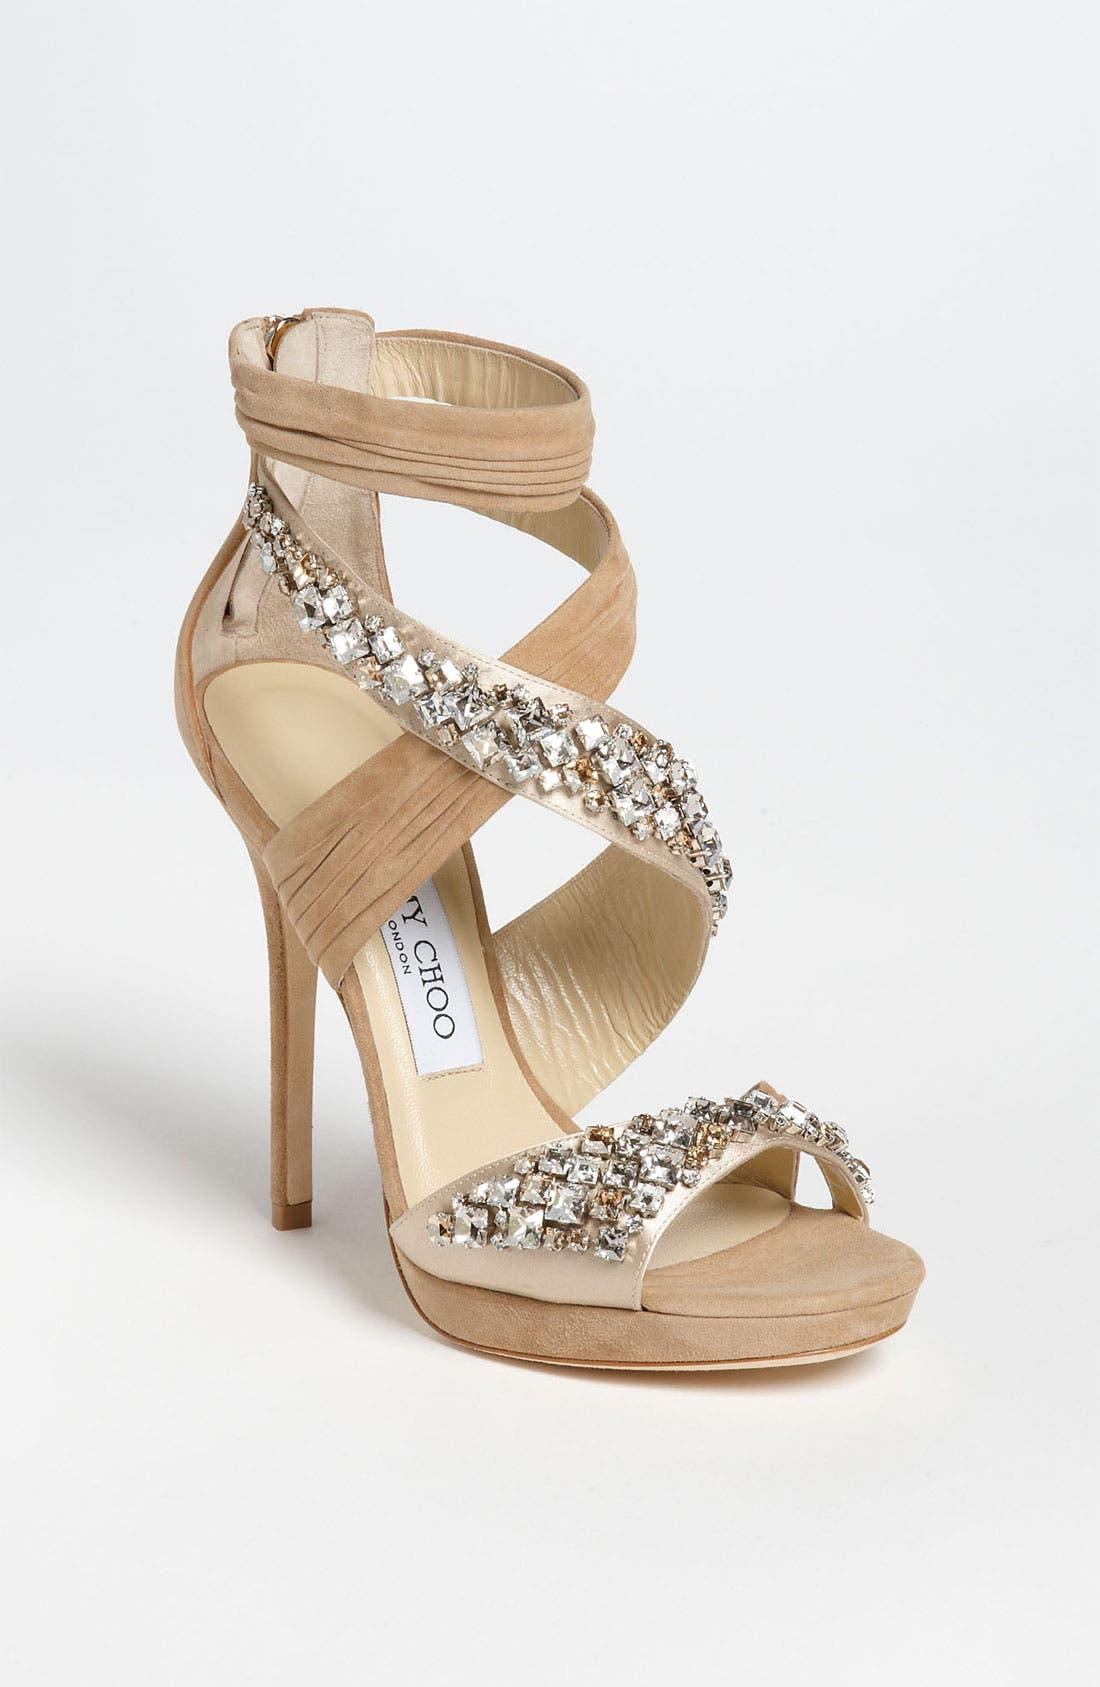 Main Image - Jimmy Choo 'Kani' Sandal